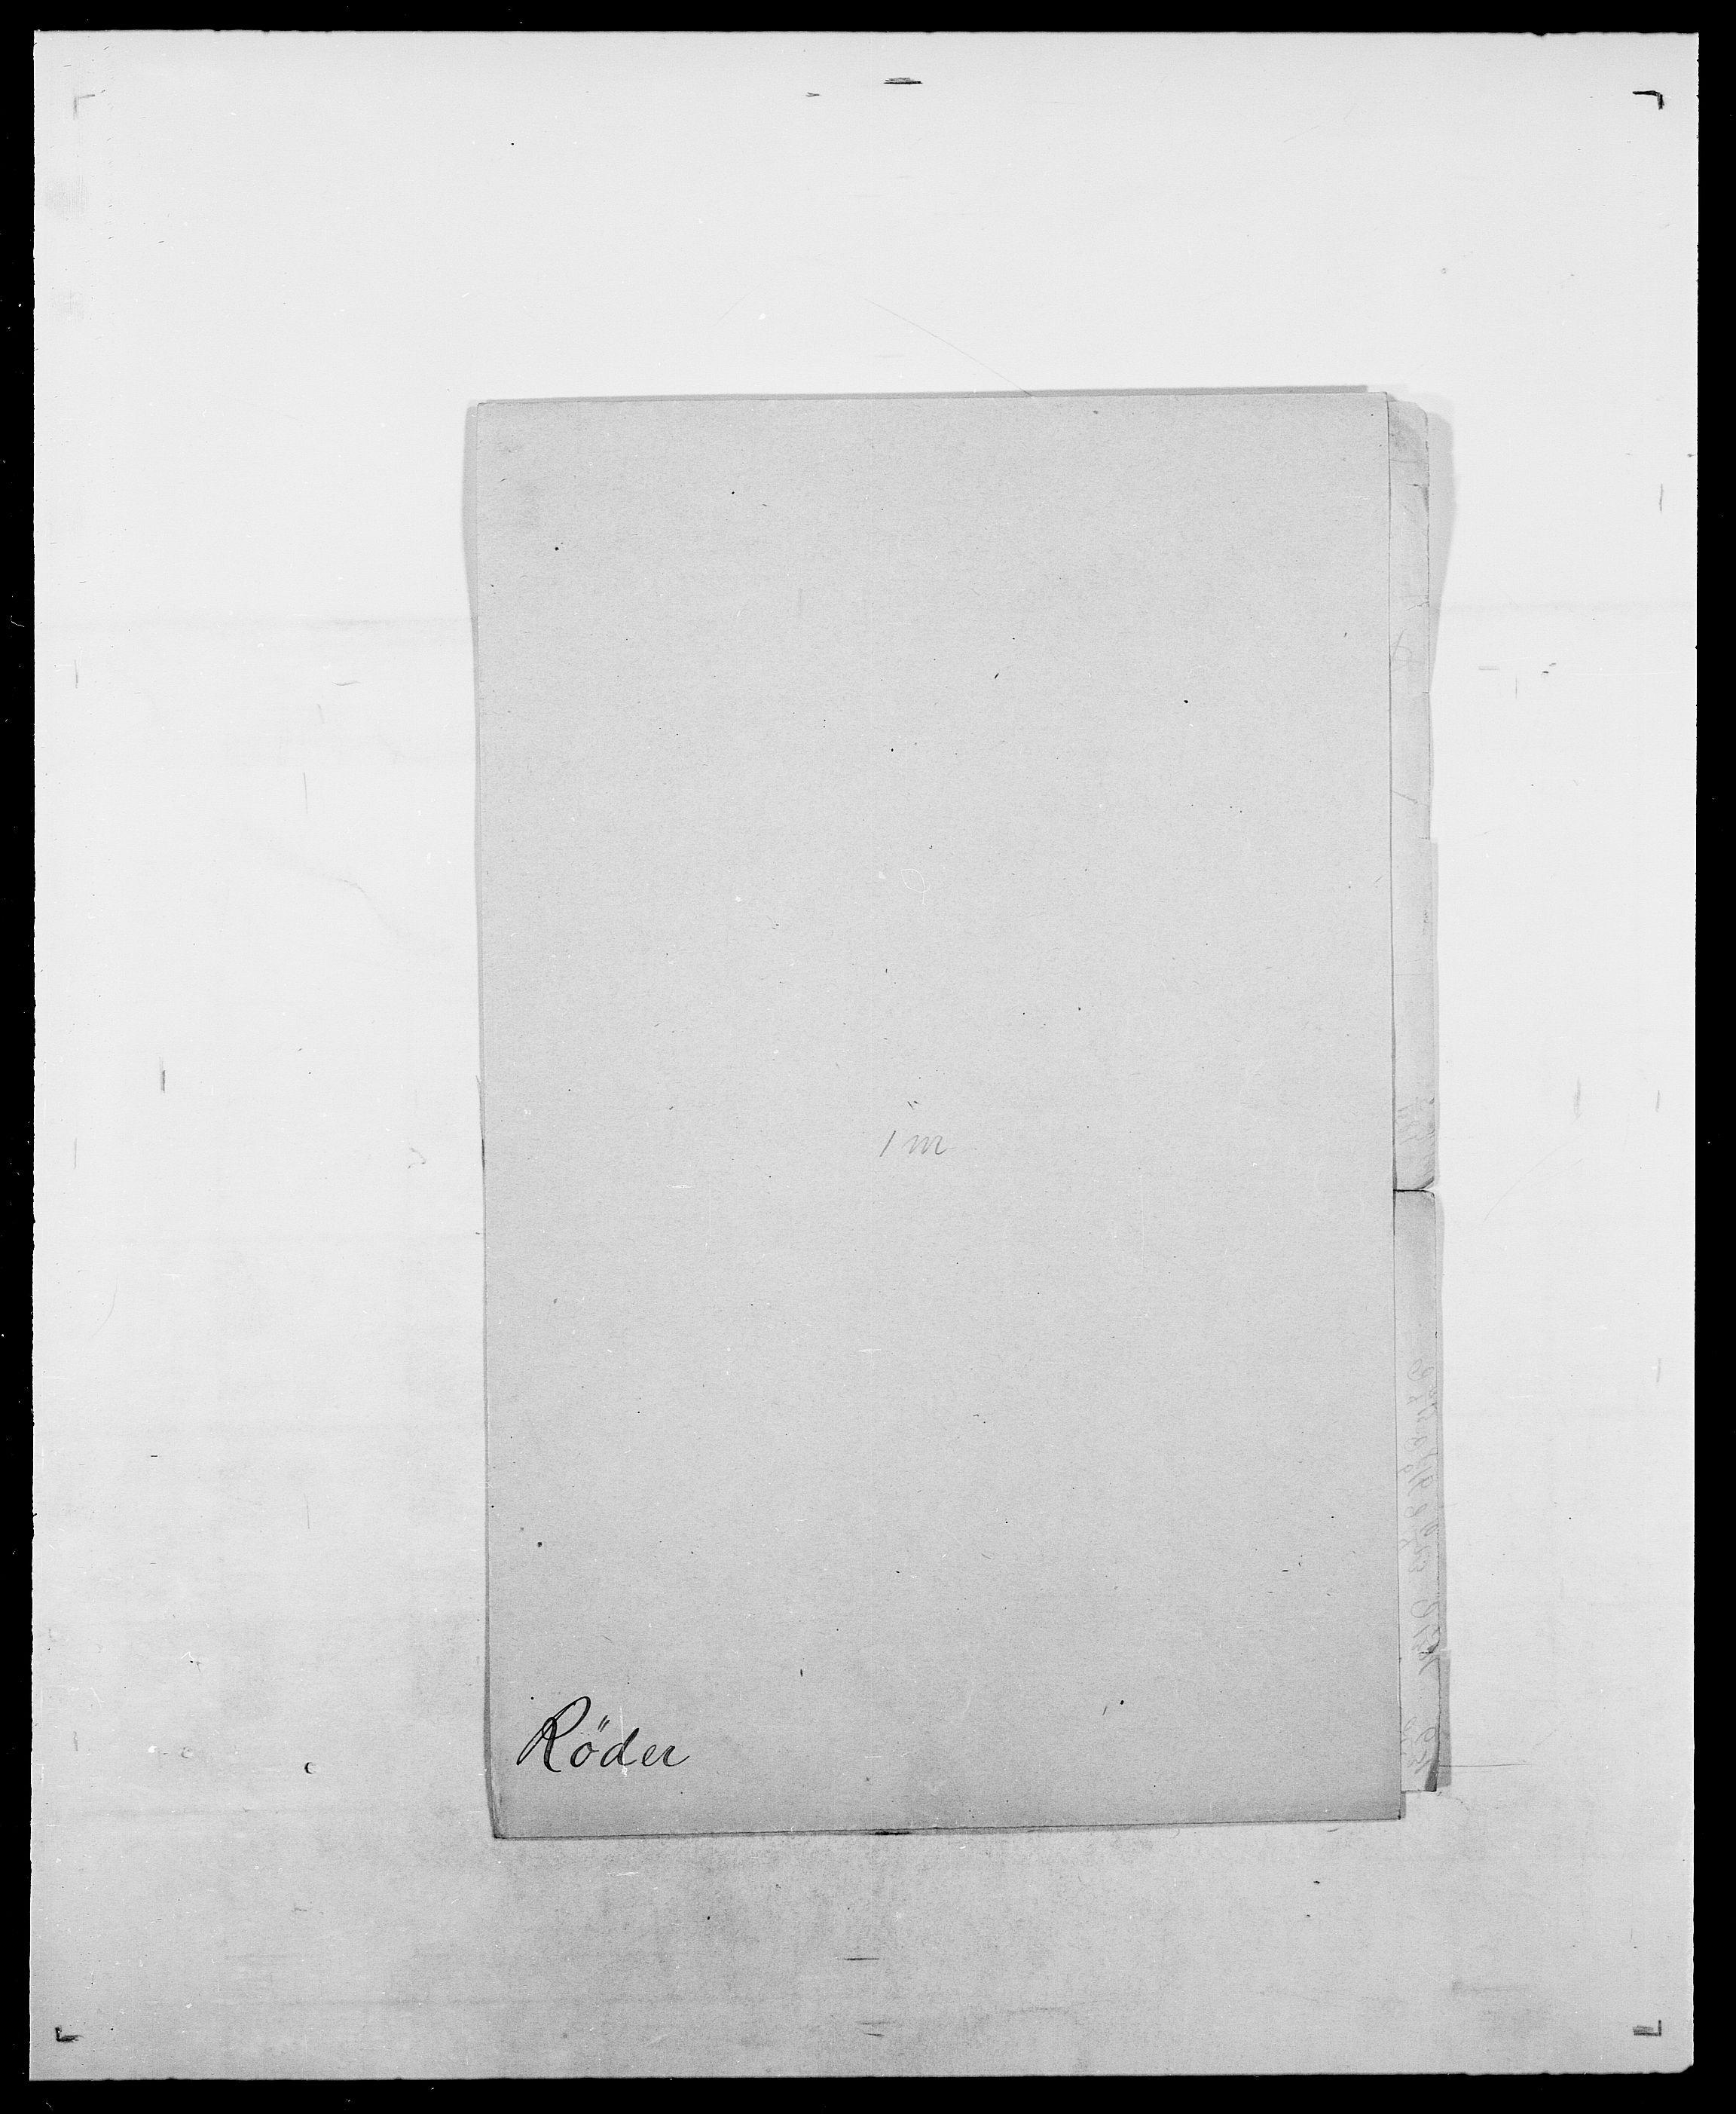 SAO, Delgobe, Charles Antoine - samling, D/Da/L0033: Roald - Røyem, s. 655